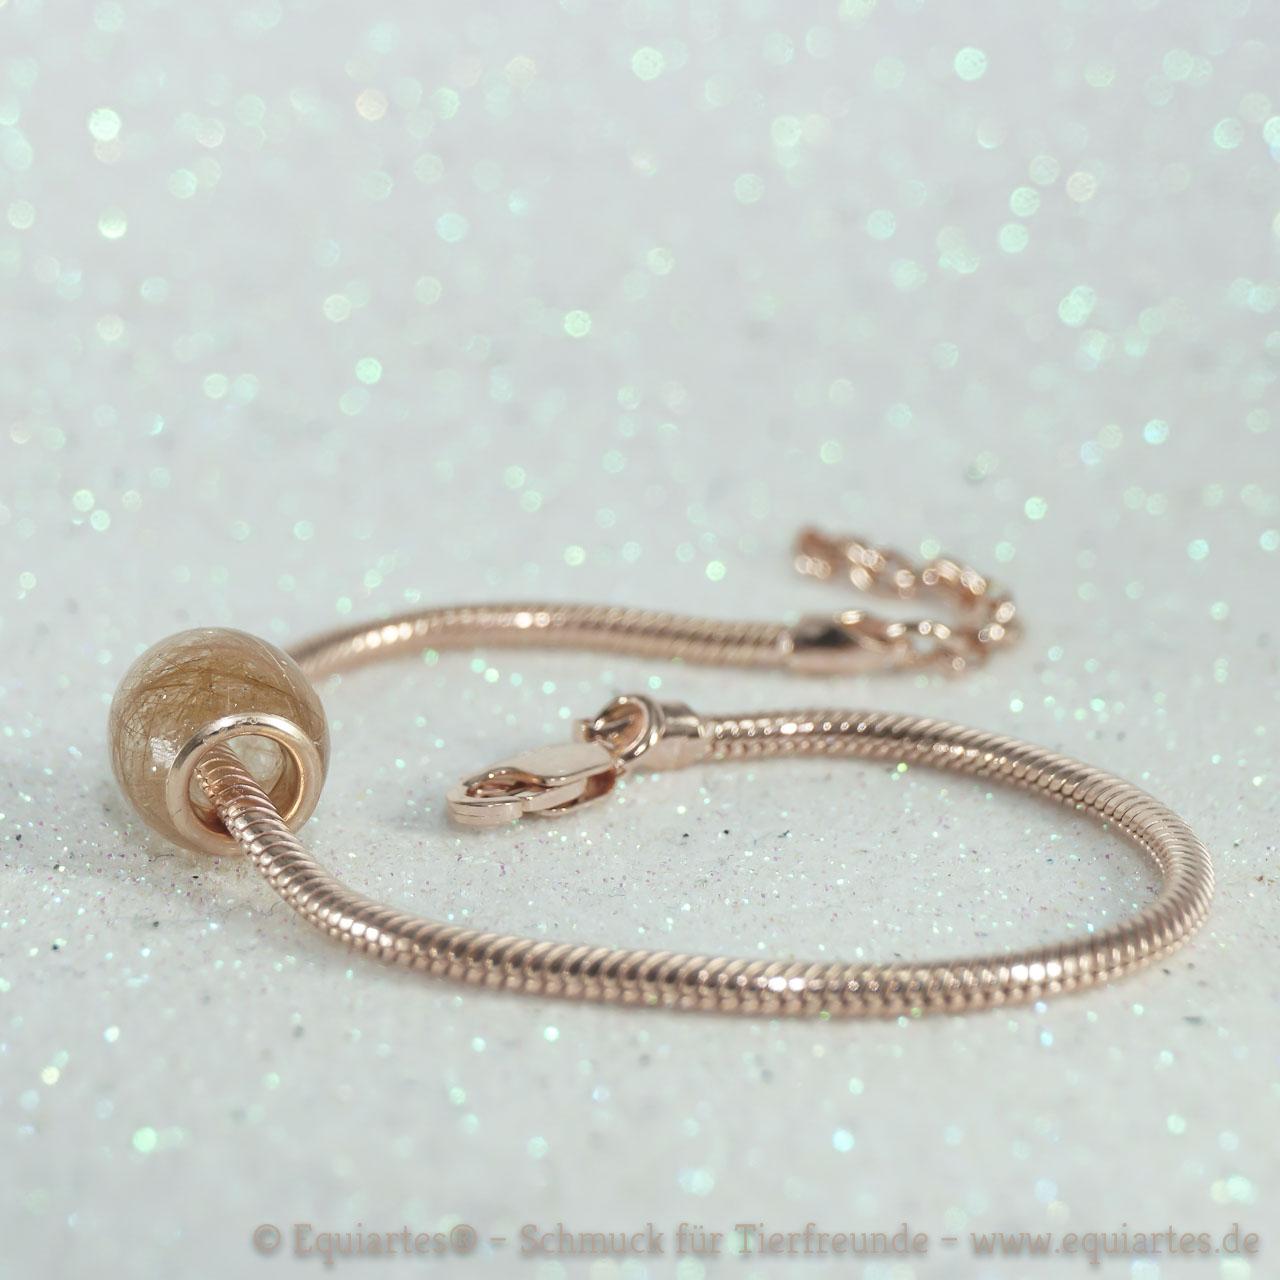 Tierhaarschmuck Schlangenarmband rosévergoldet Serpens V mit Großlochperle Silverstar Long S von Equiartes